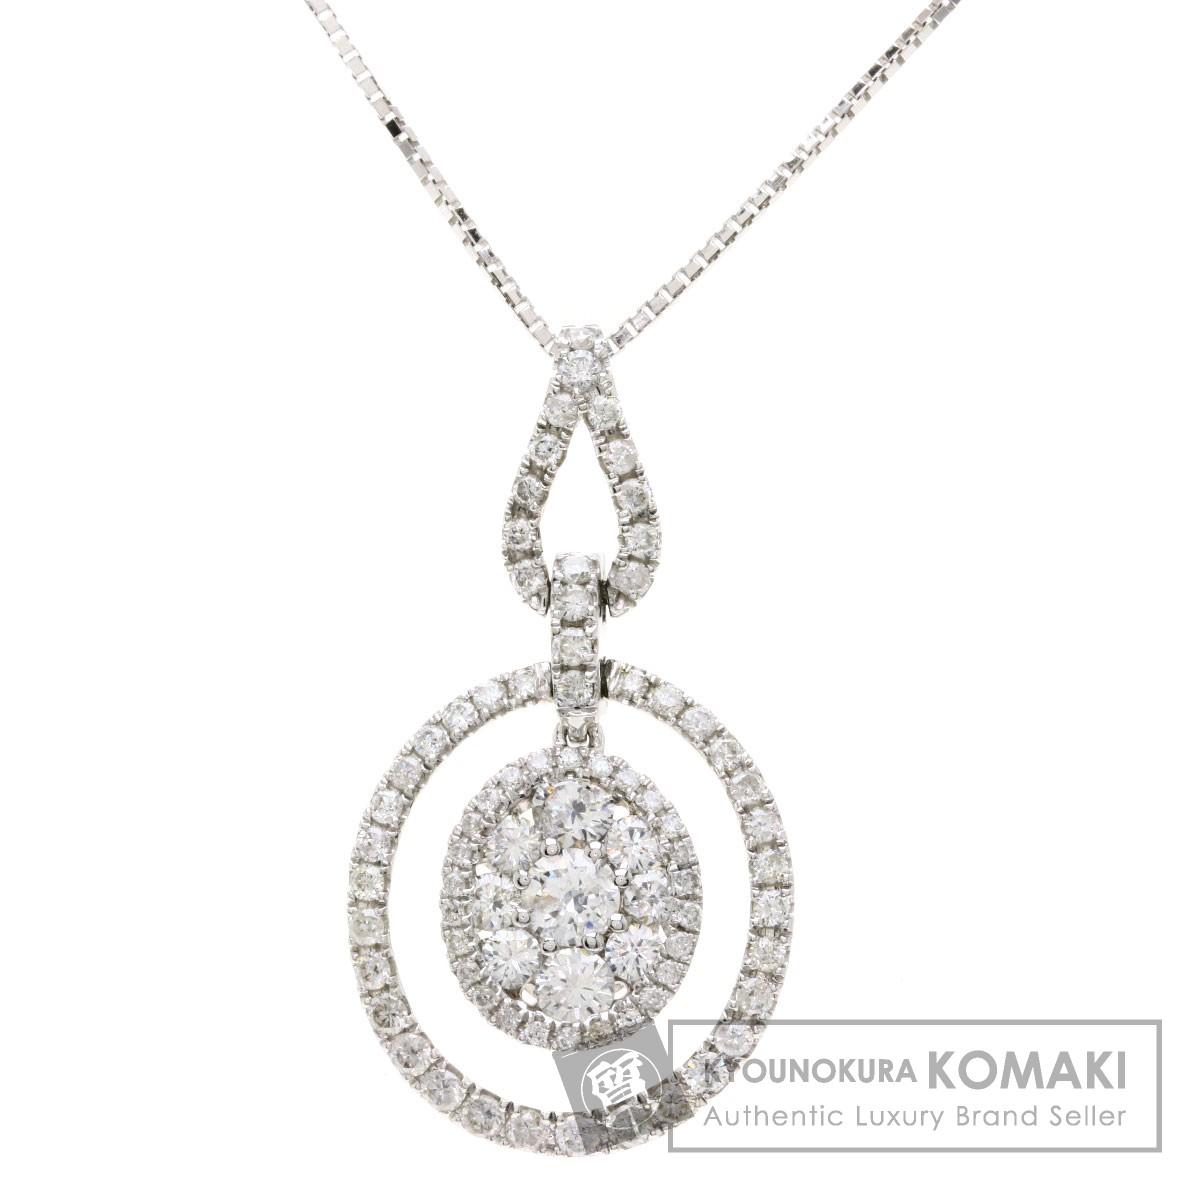 0.86ct ダイヤモンド ネックレス K18ホワイトゴールド 4.6g レディース 【中古】